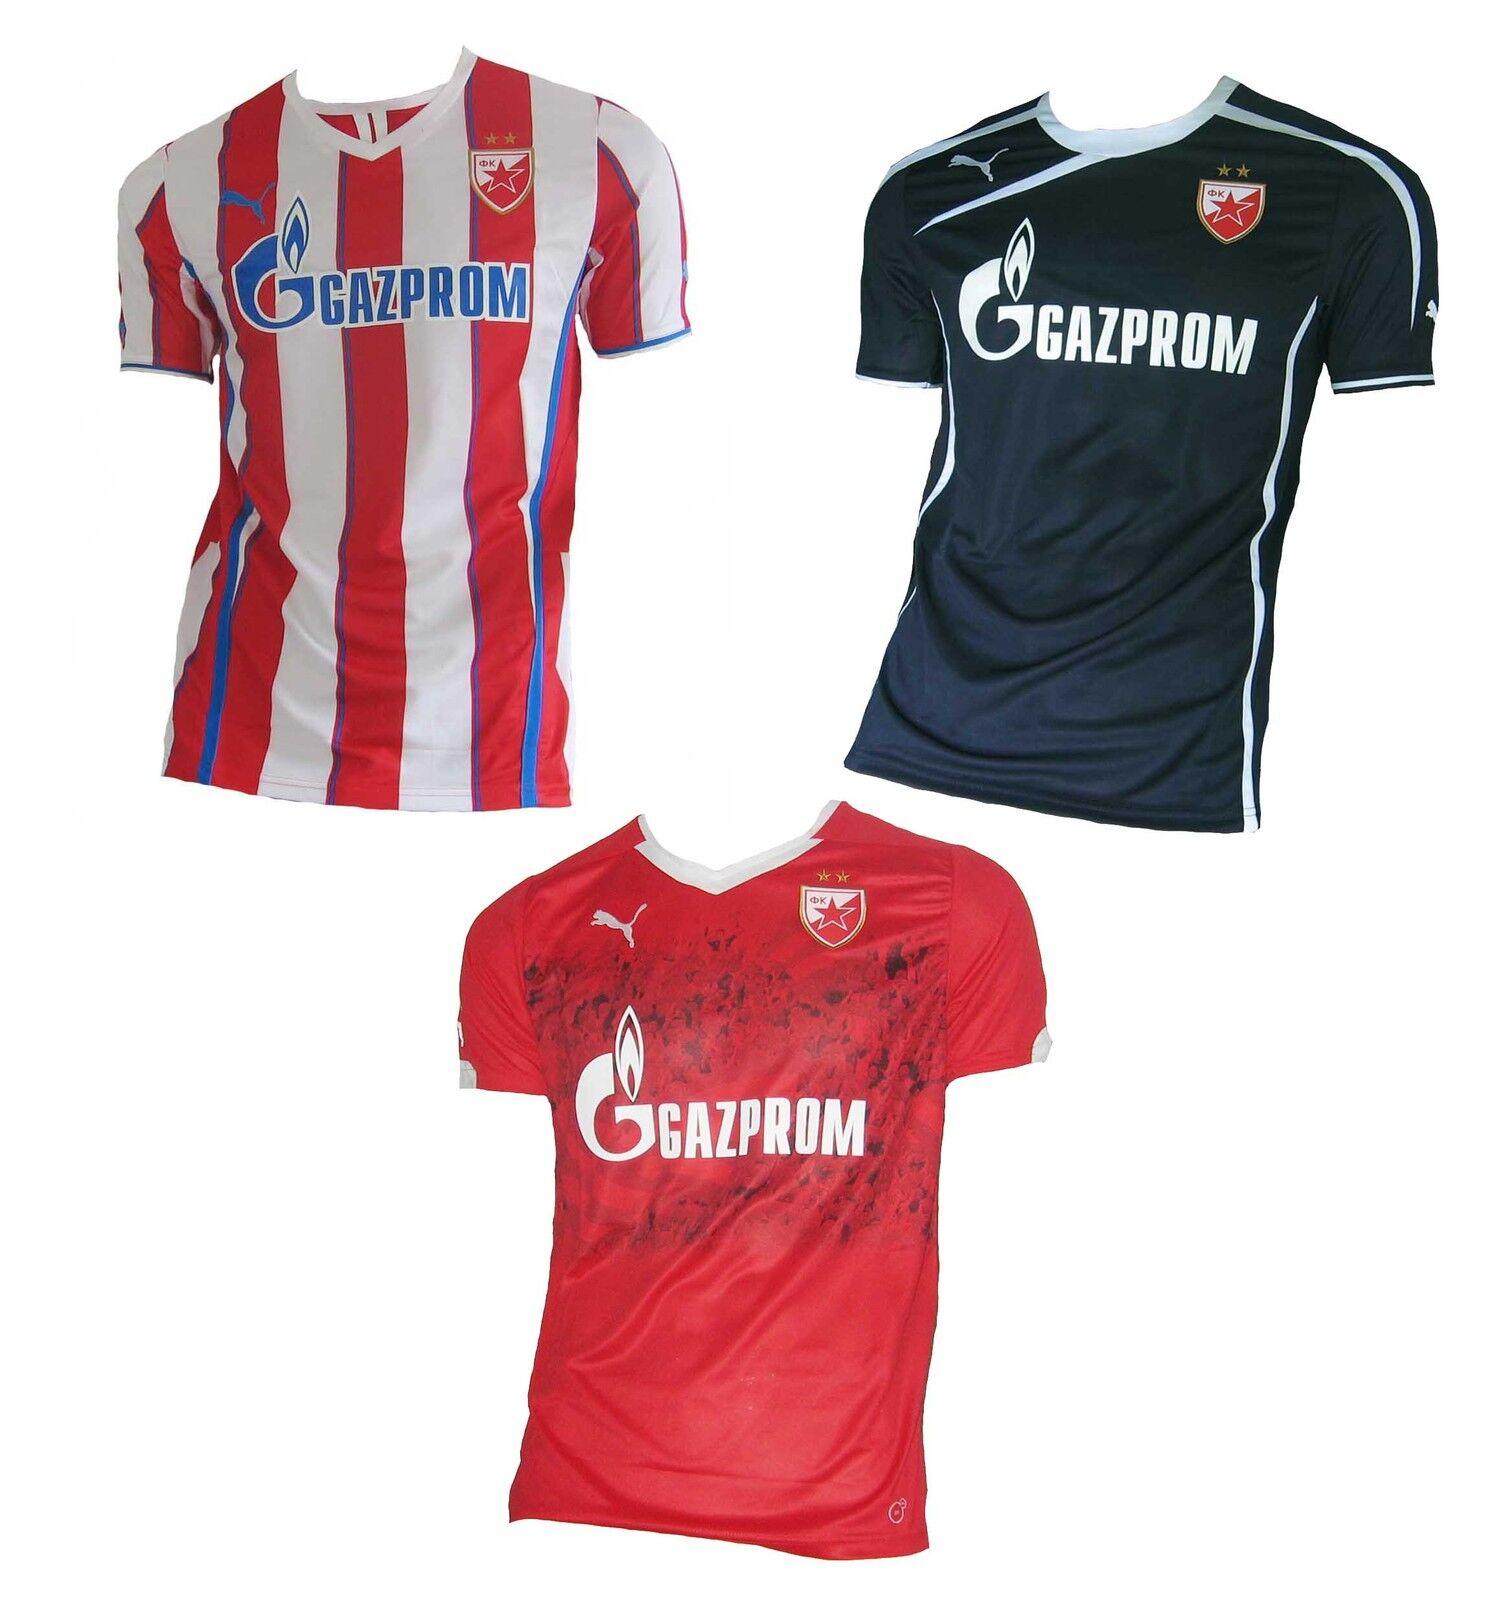 Roter Stern Belgrad Trikot Puma Crvena Zvezda Serbien  | | | Starker Wert  2eb38e